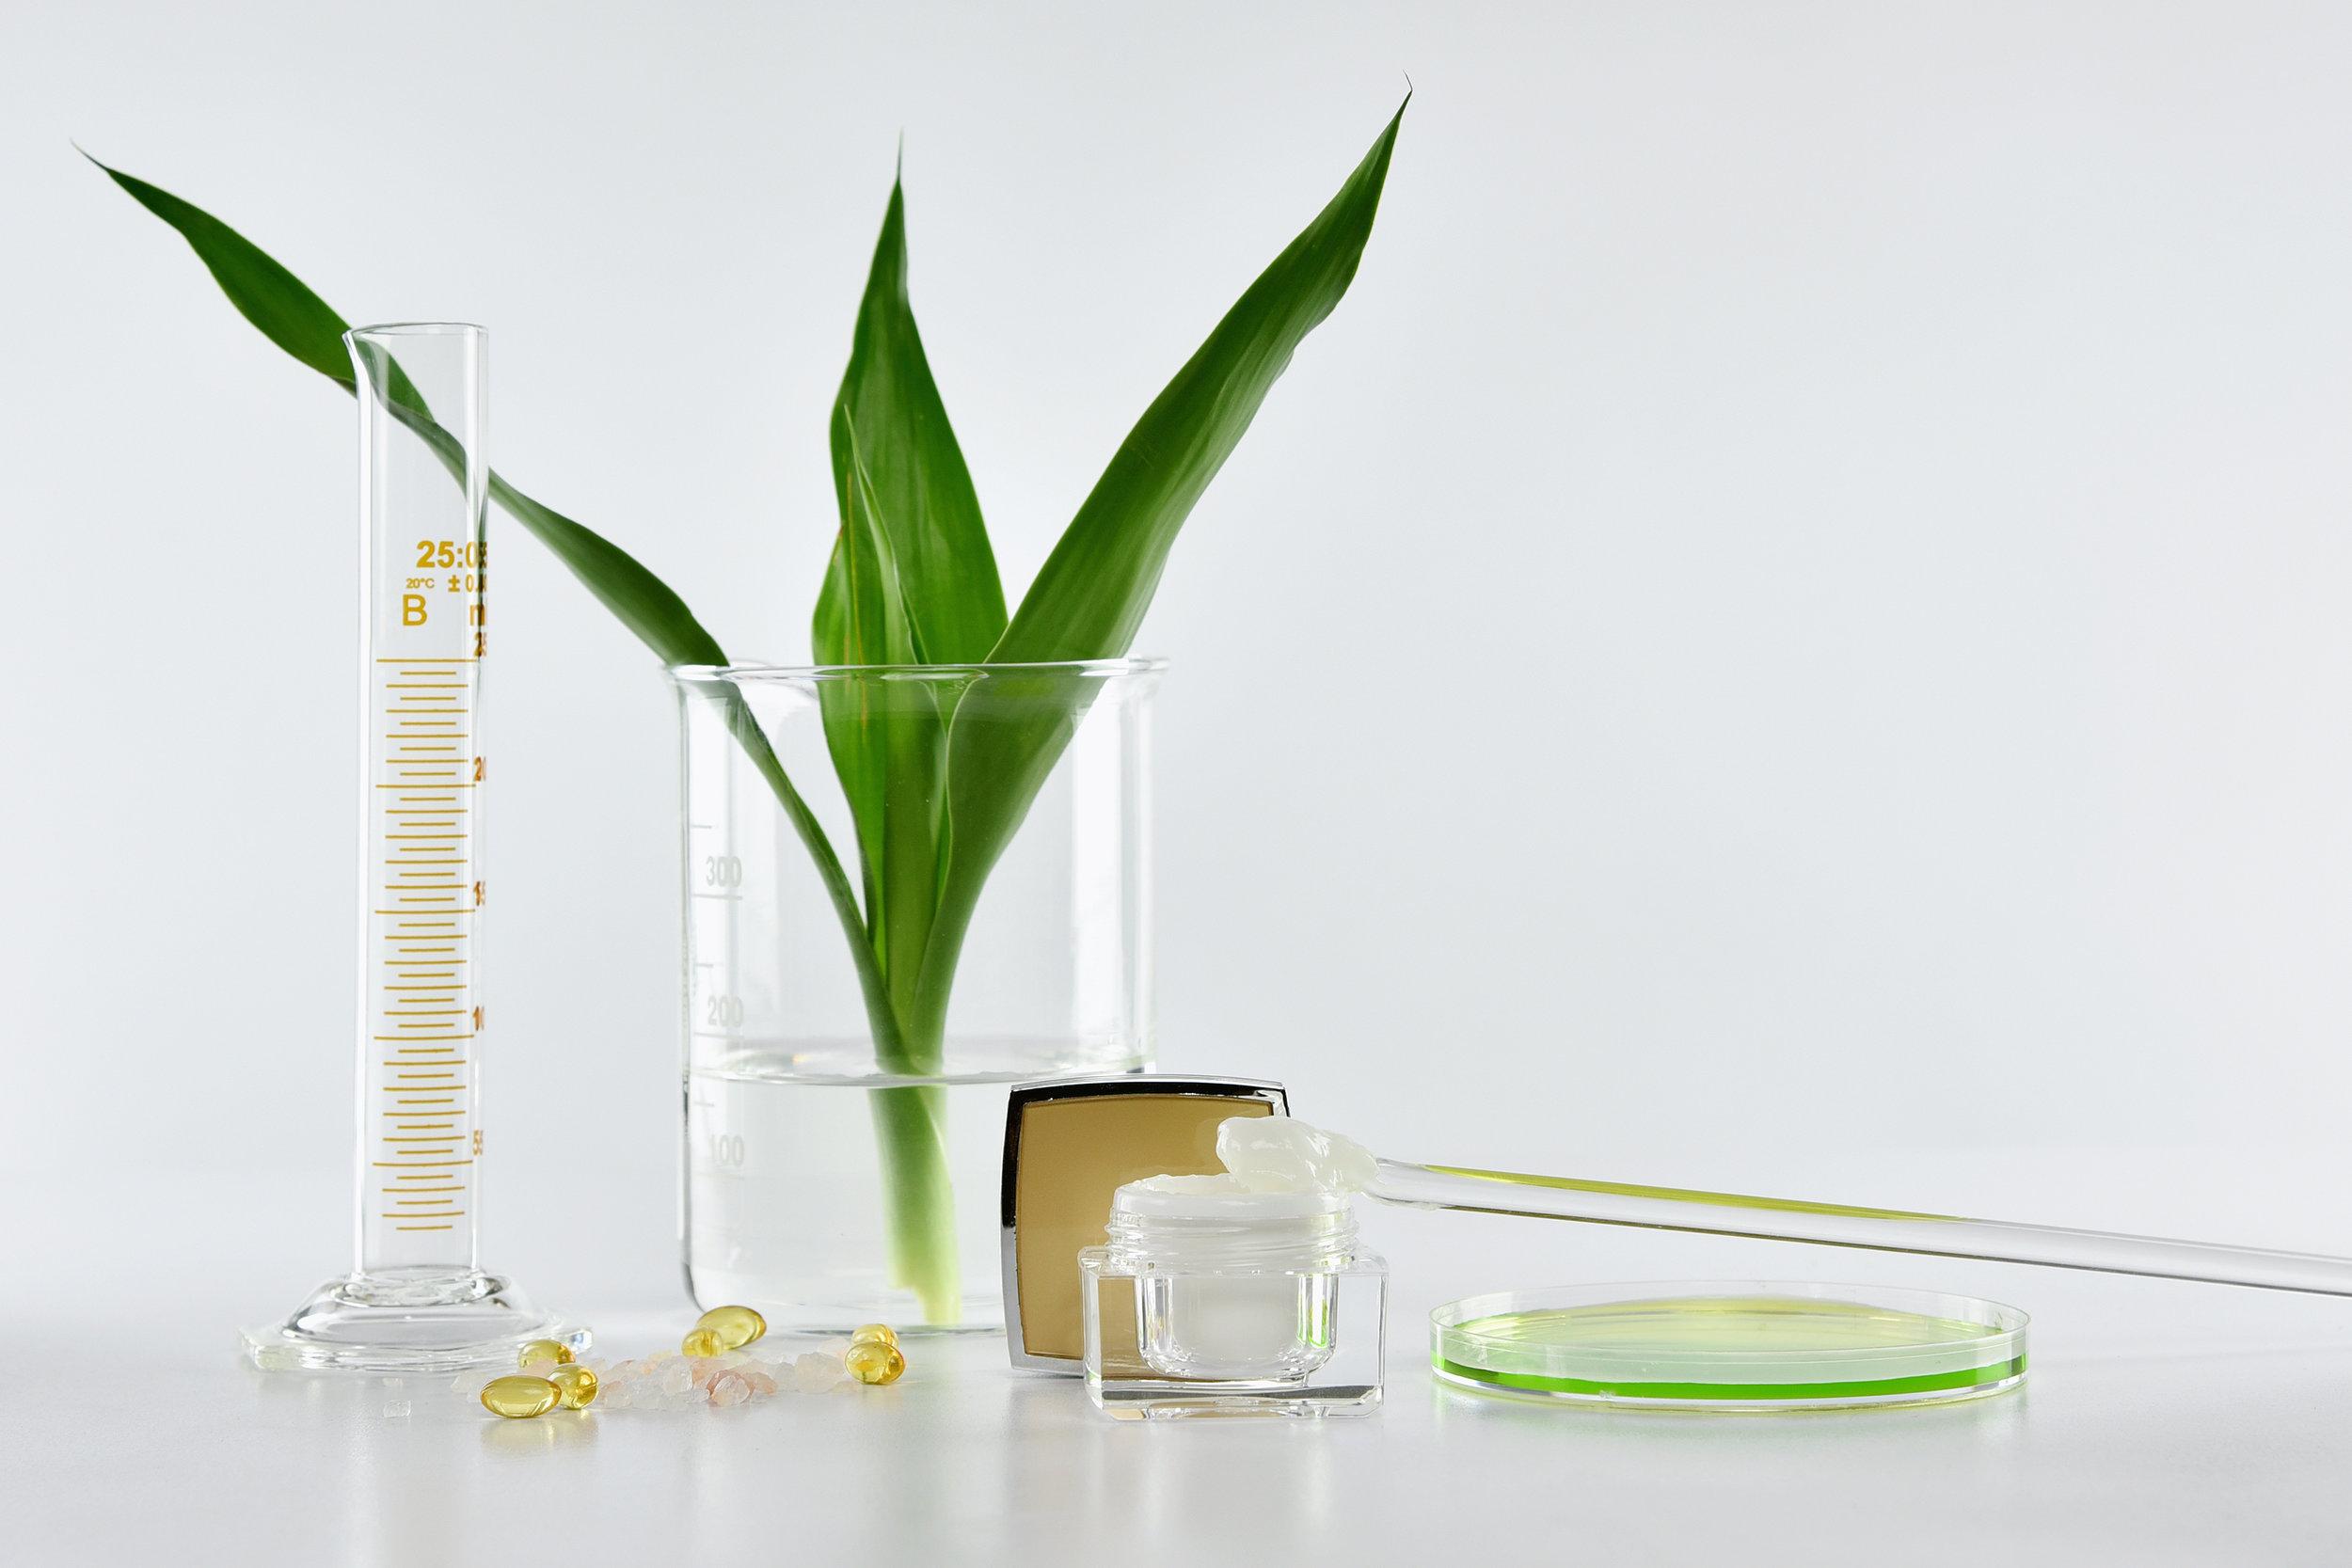 Skin Care Cosmetics Manufacturer Australia